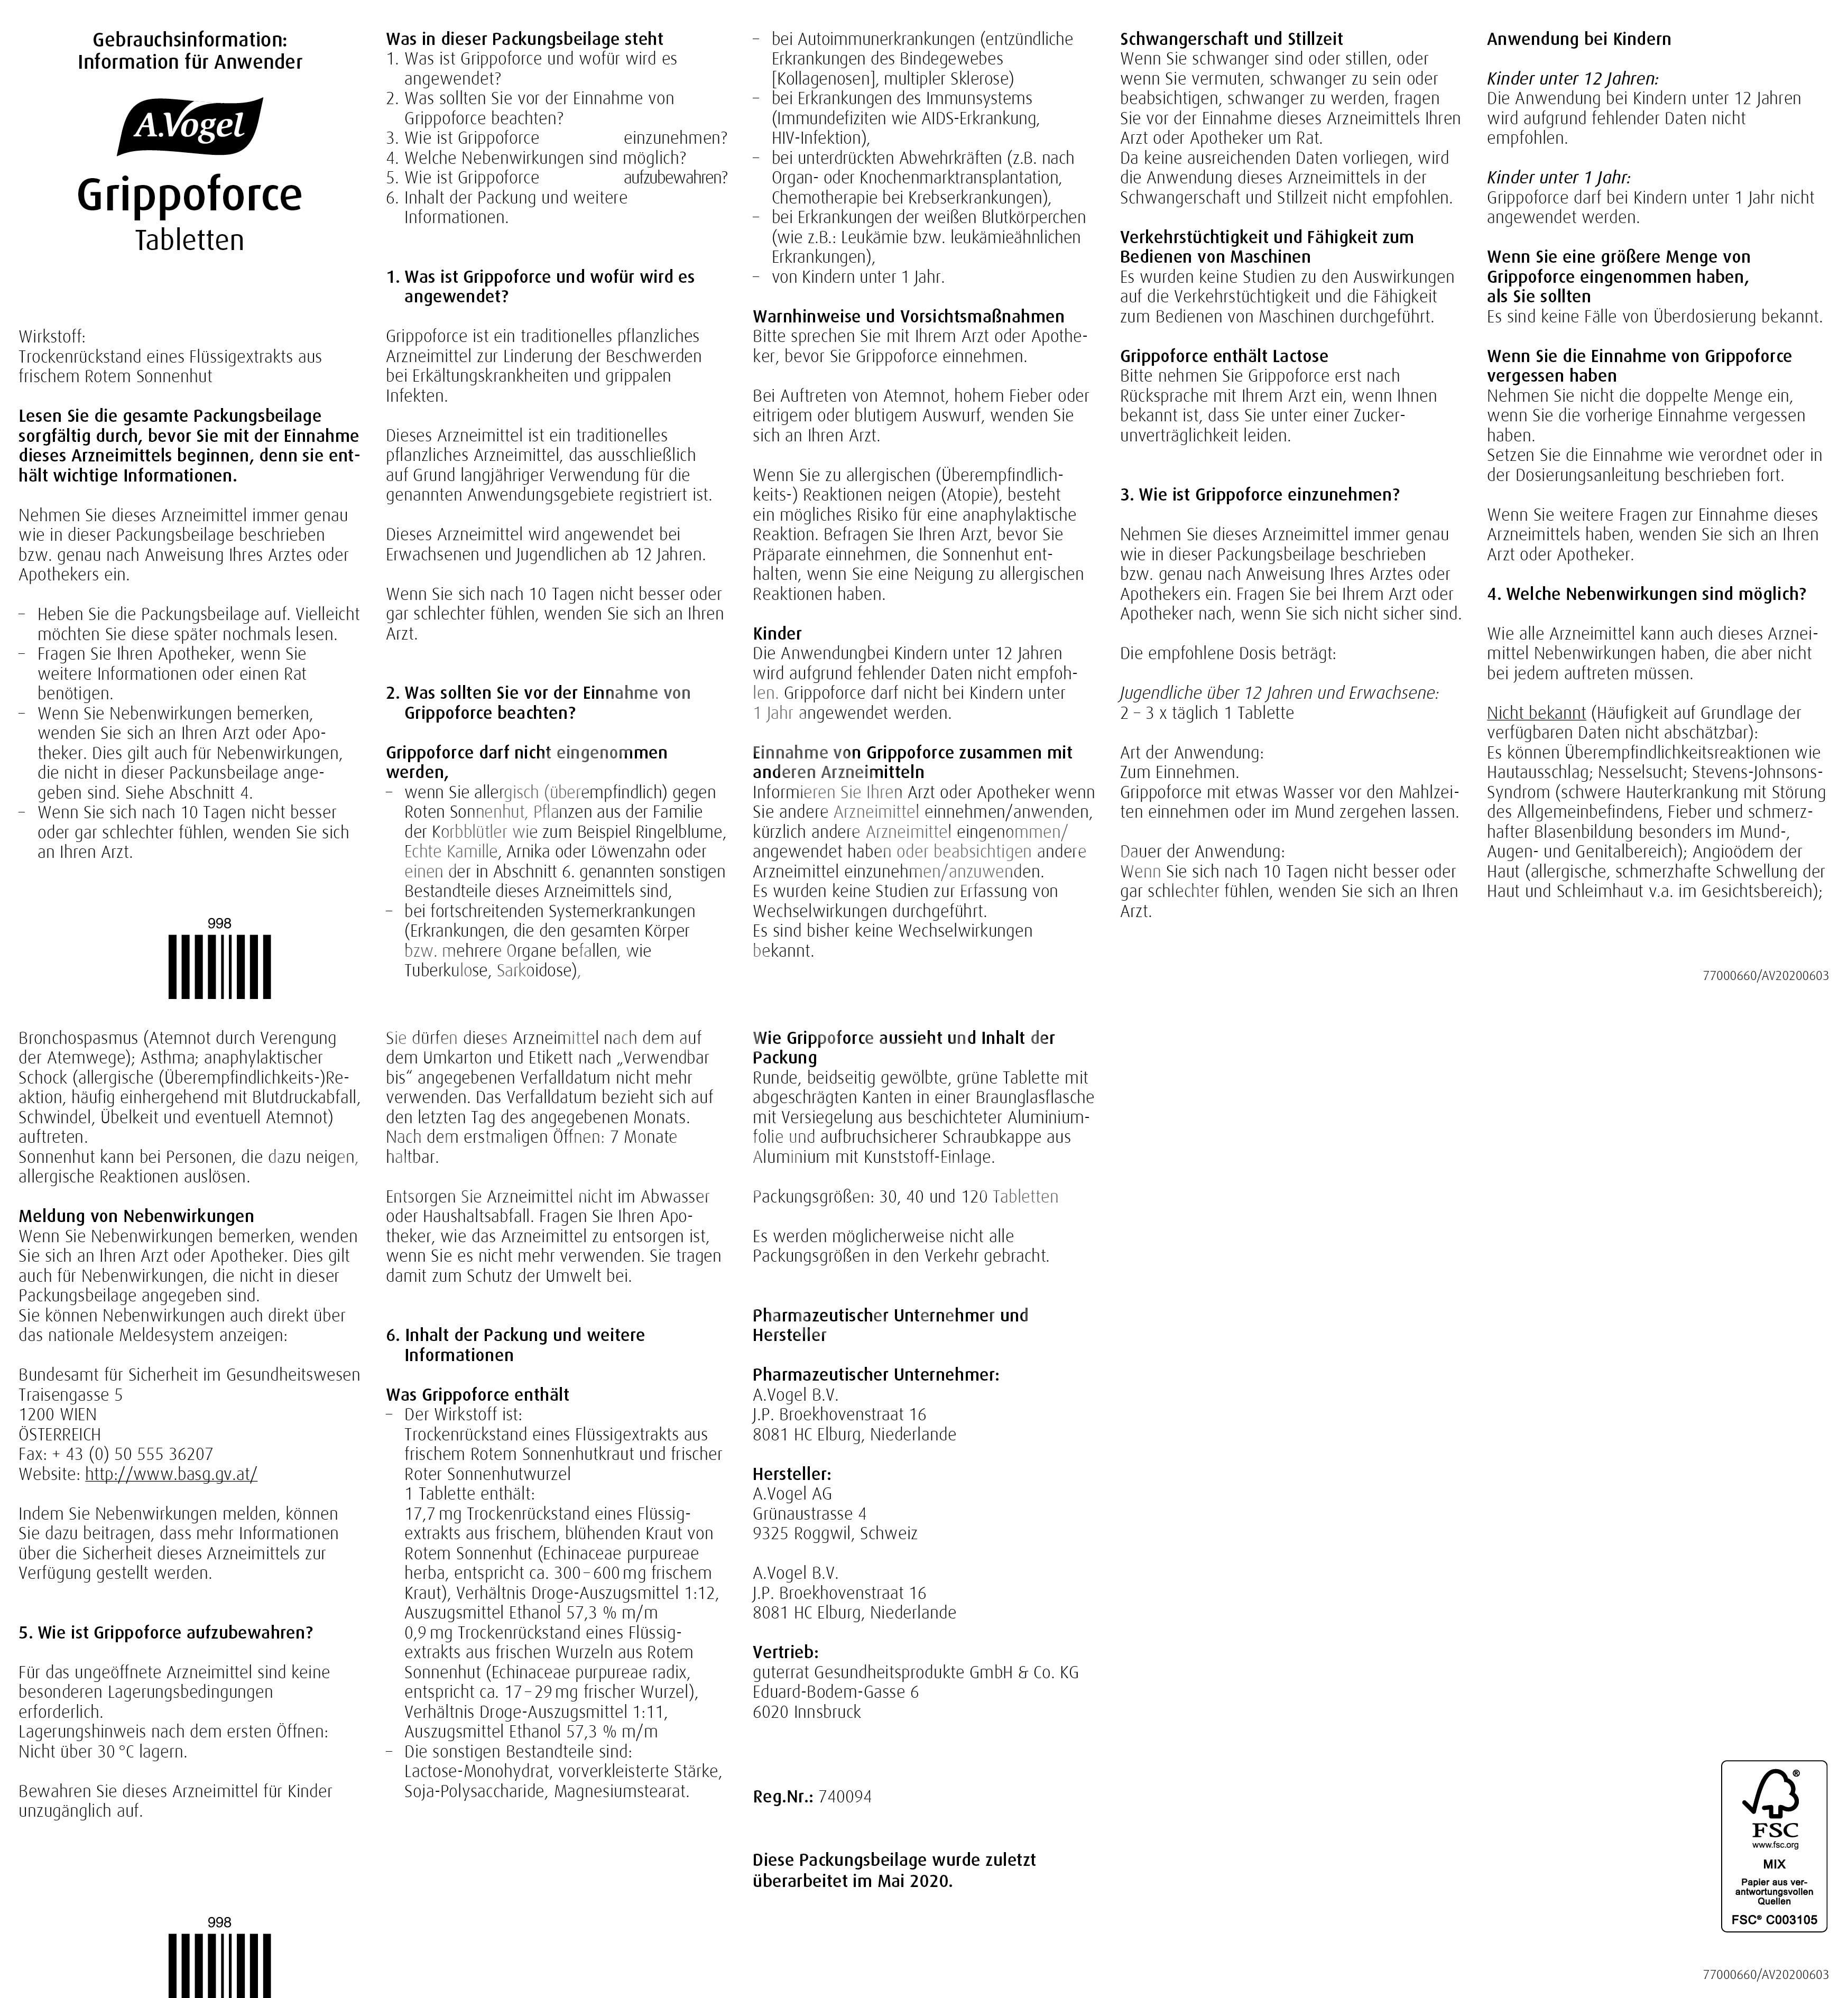 A.Vogel Grippoforce Tabletten